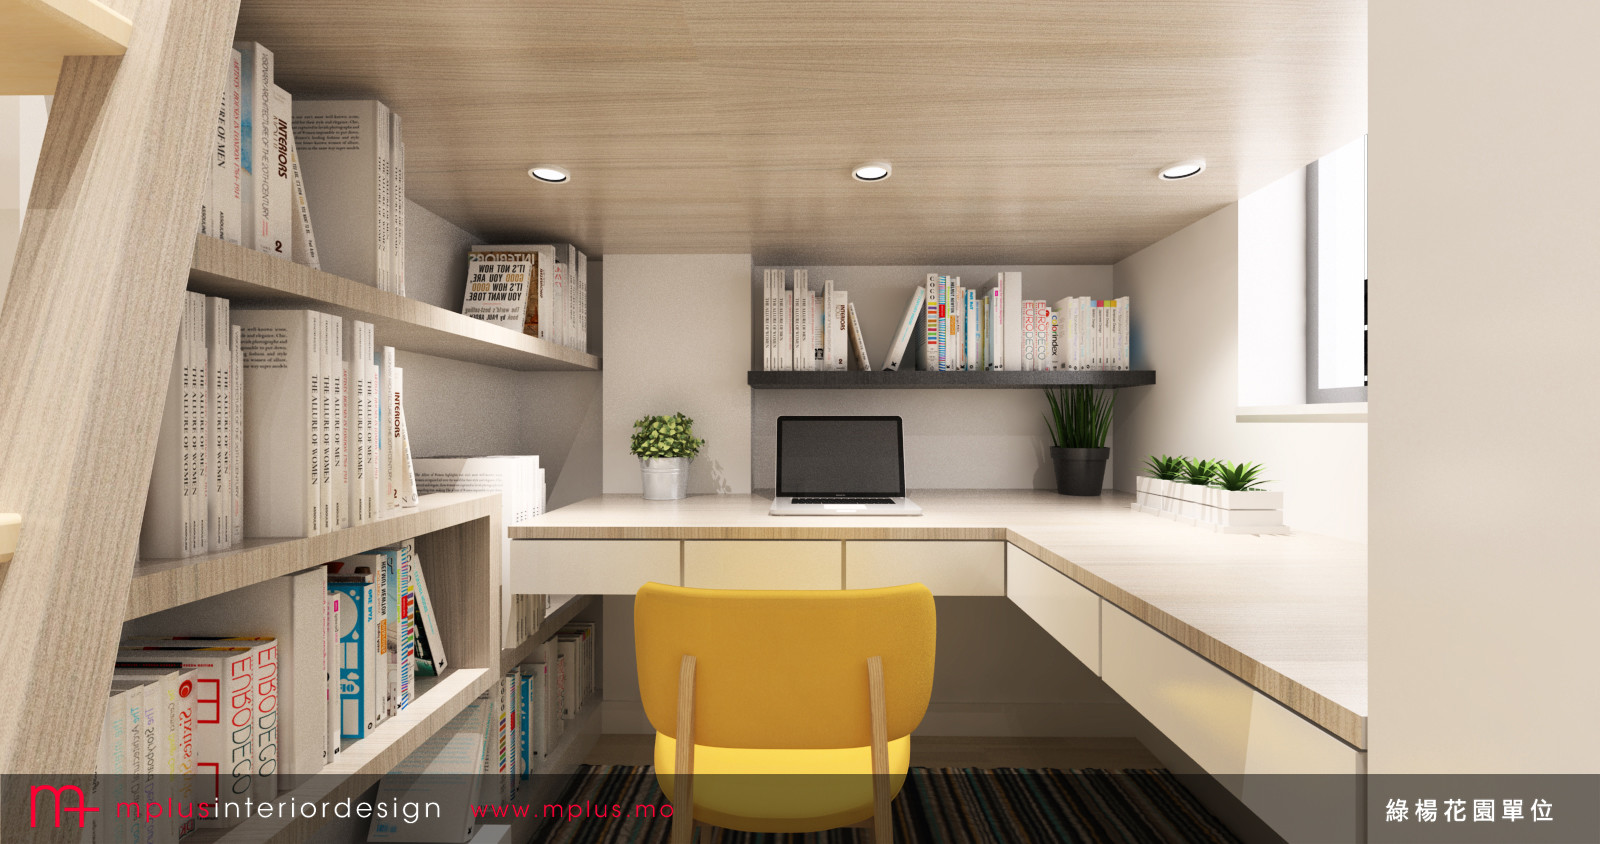 Edf lok yeung mplus interior design macau - Residential interior designers near me ...